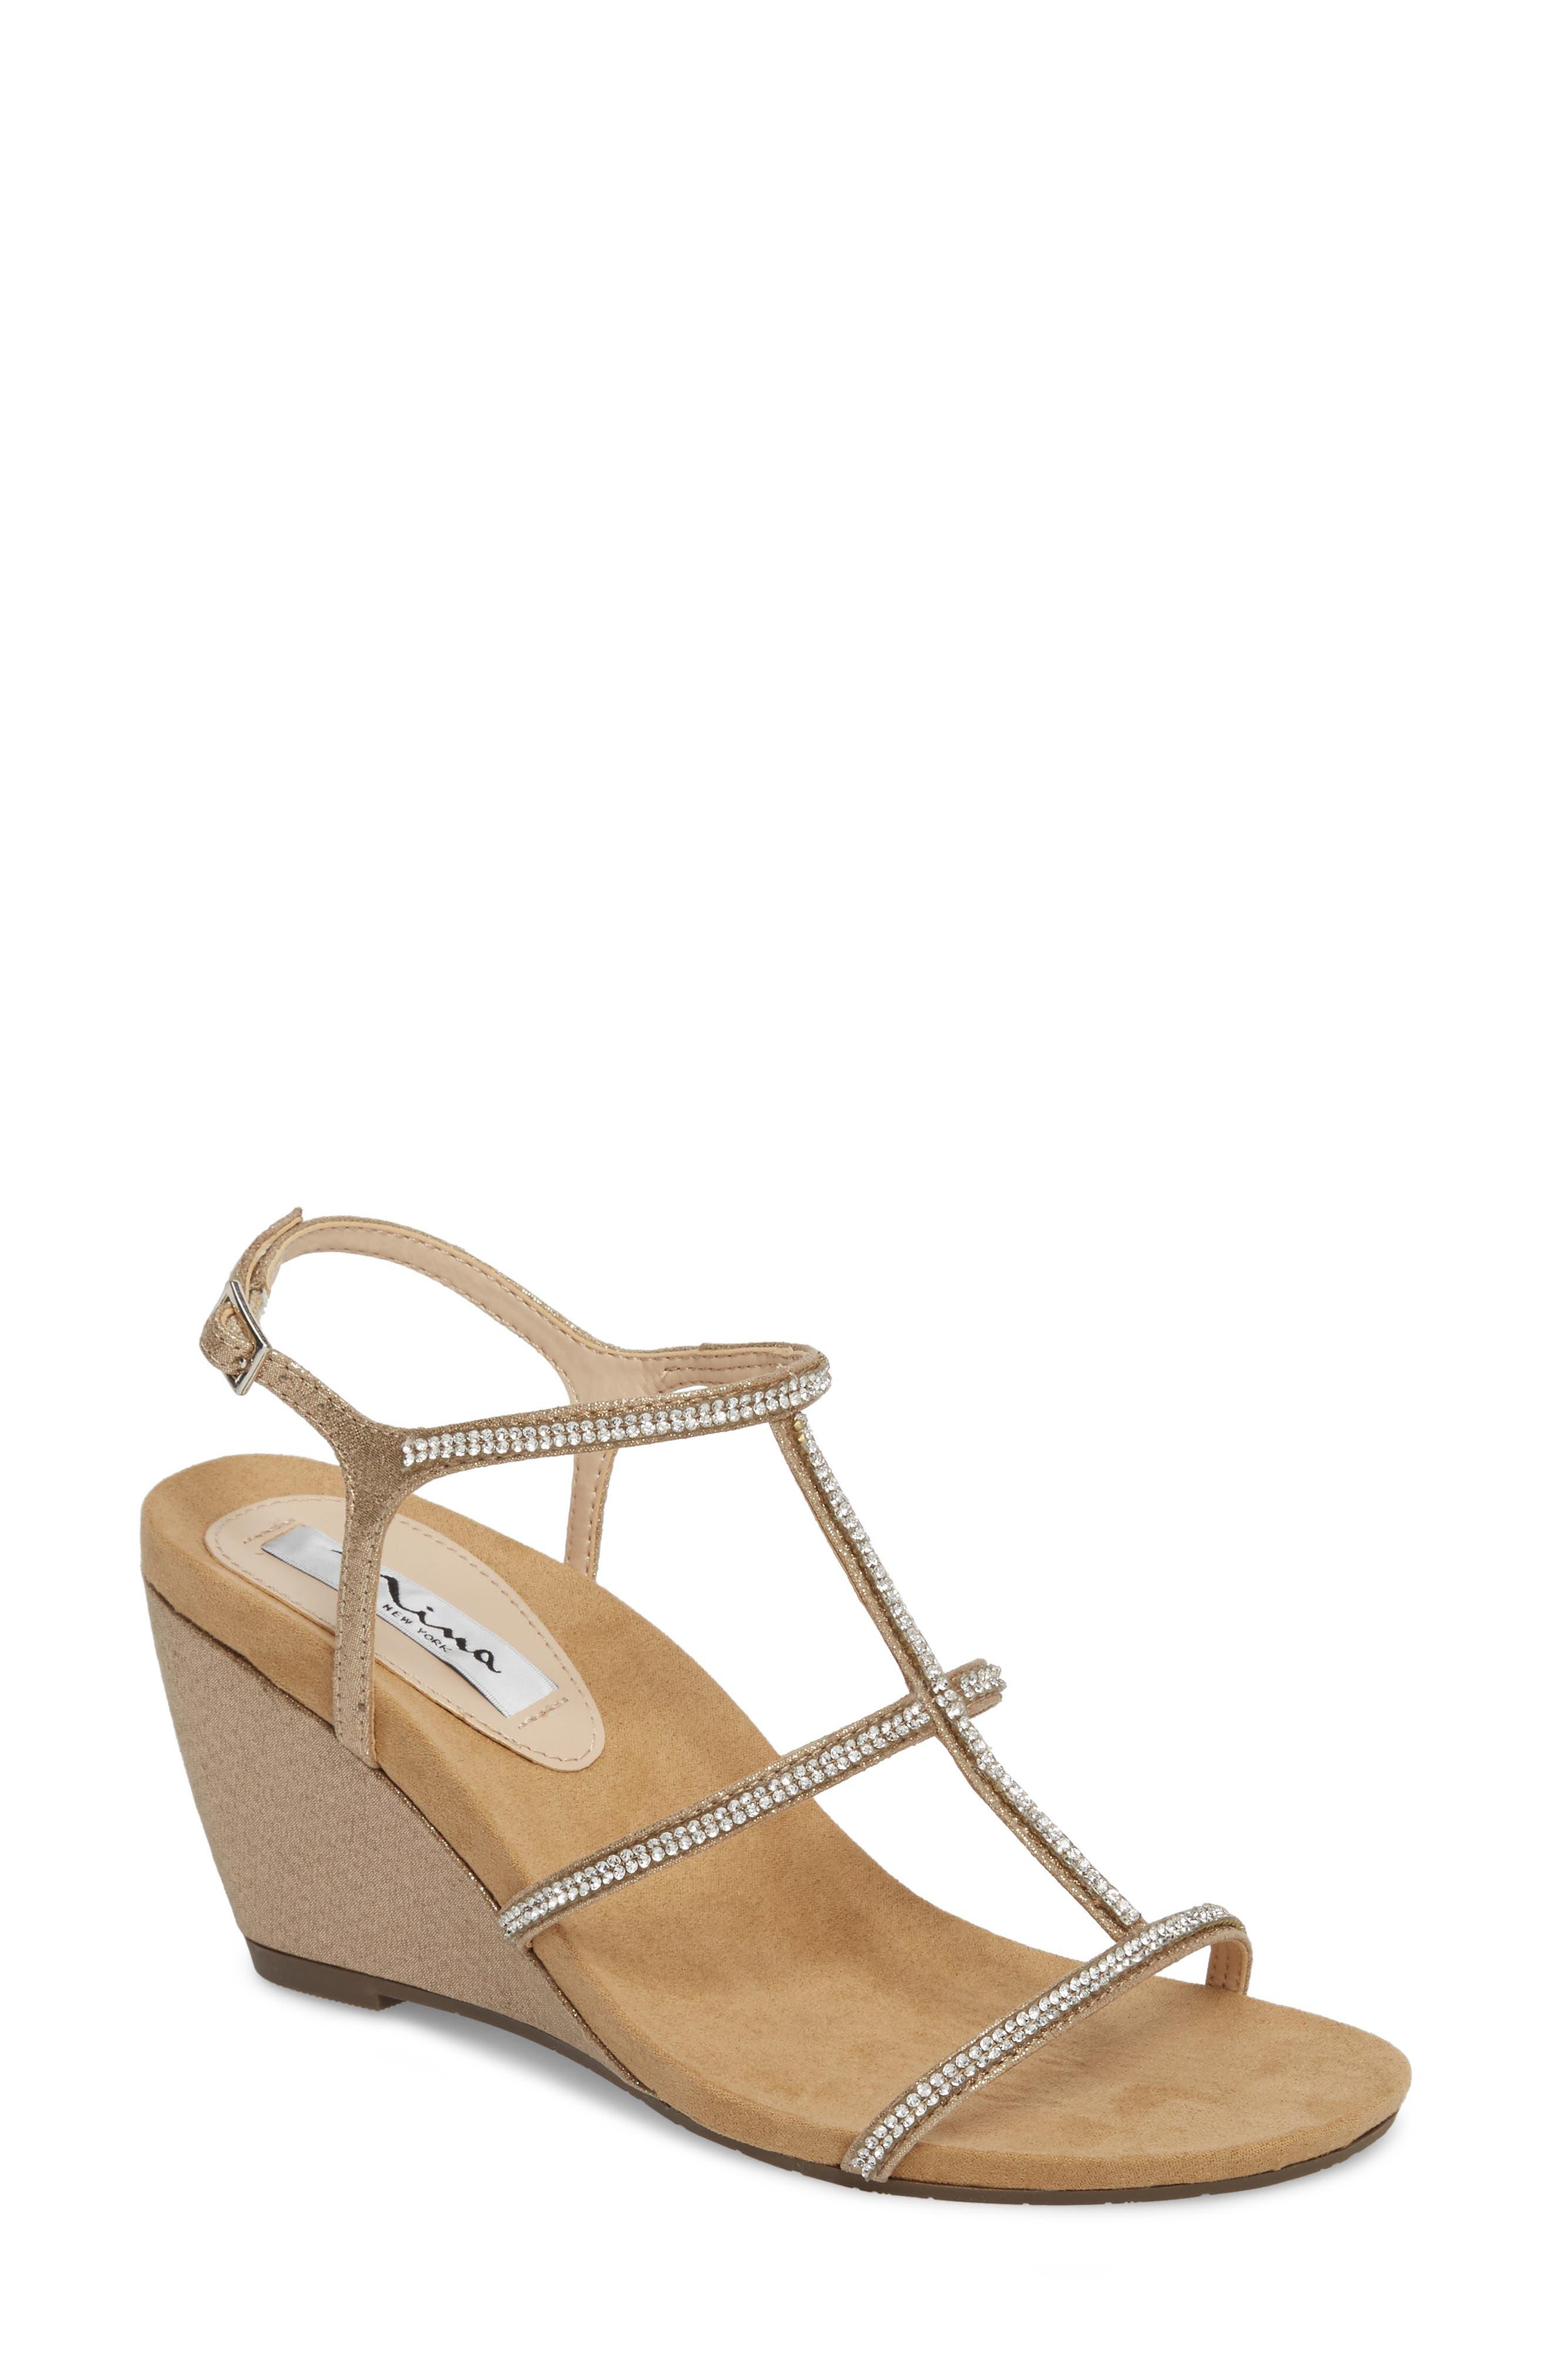 ce98f4d488d1 Nina Siana Wedge Sandal In Taupe Fabric